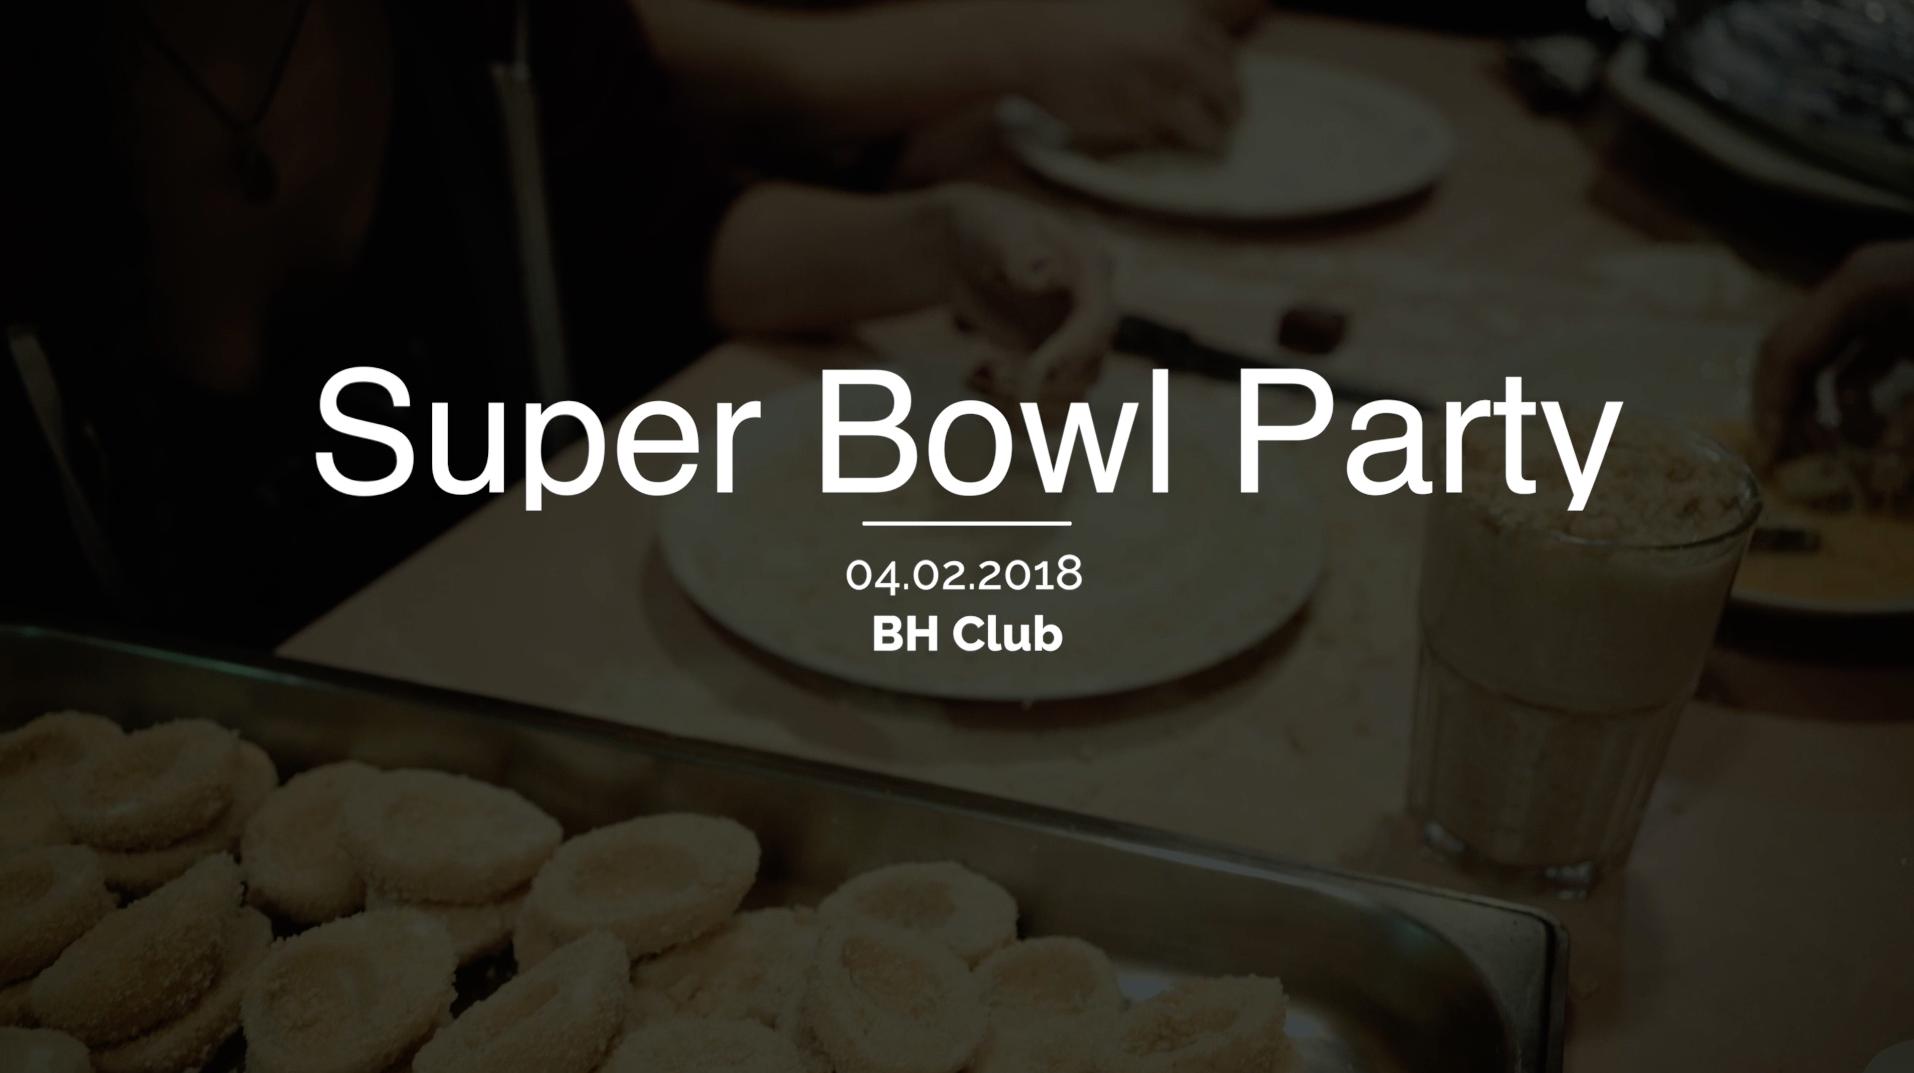 Super Bowl Party 2018 BH Club Ilmenau